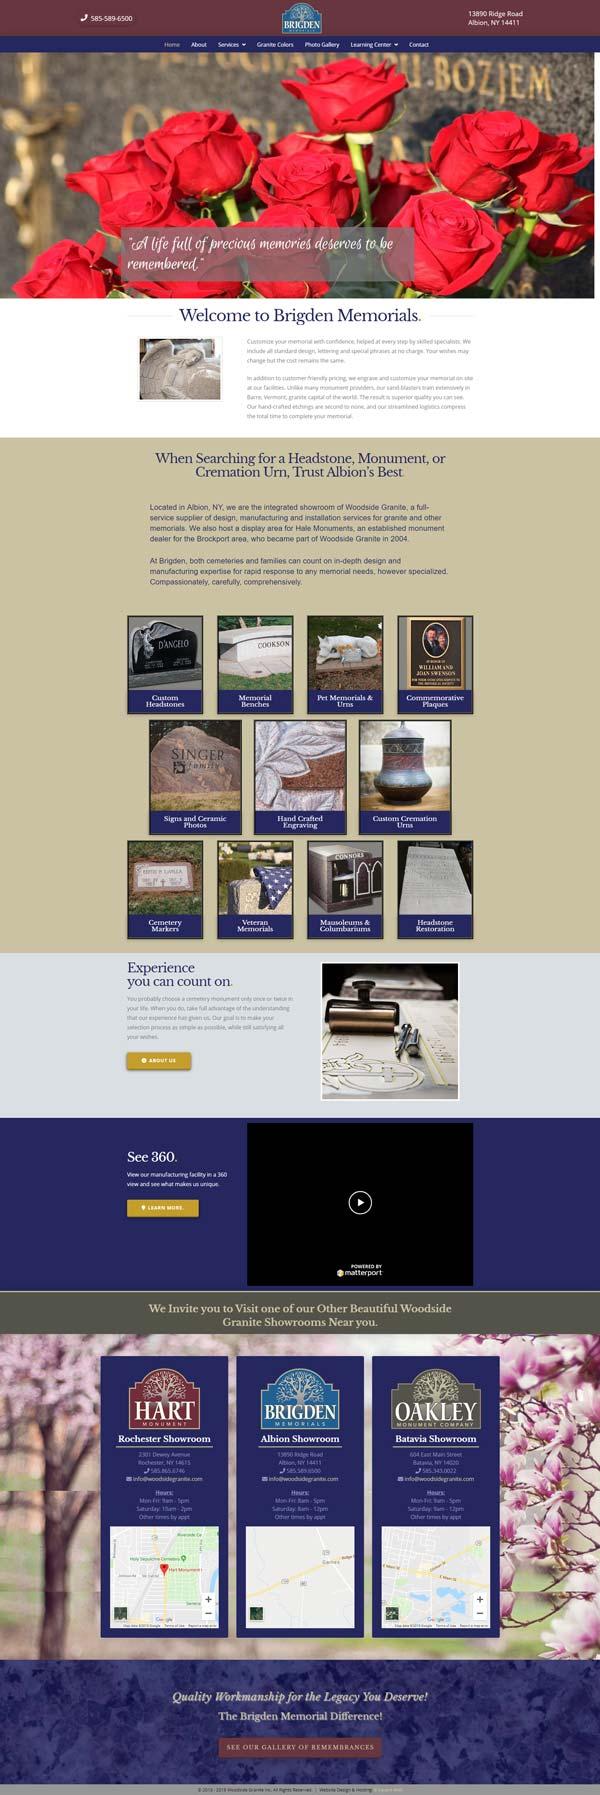 Brigden Memorials- Monument Company home page screen print